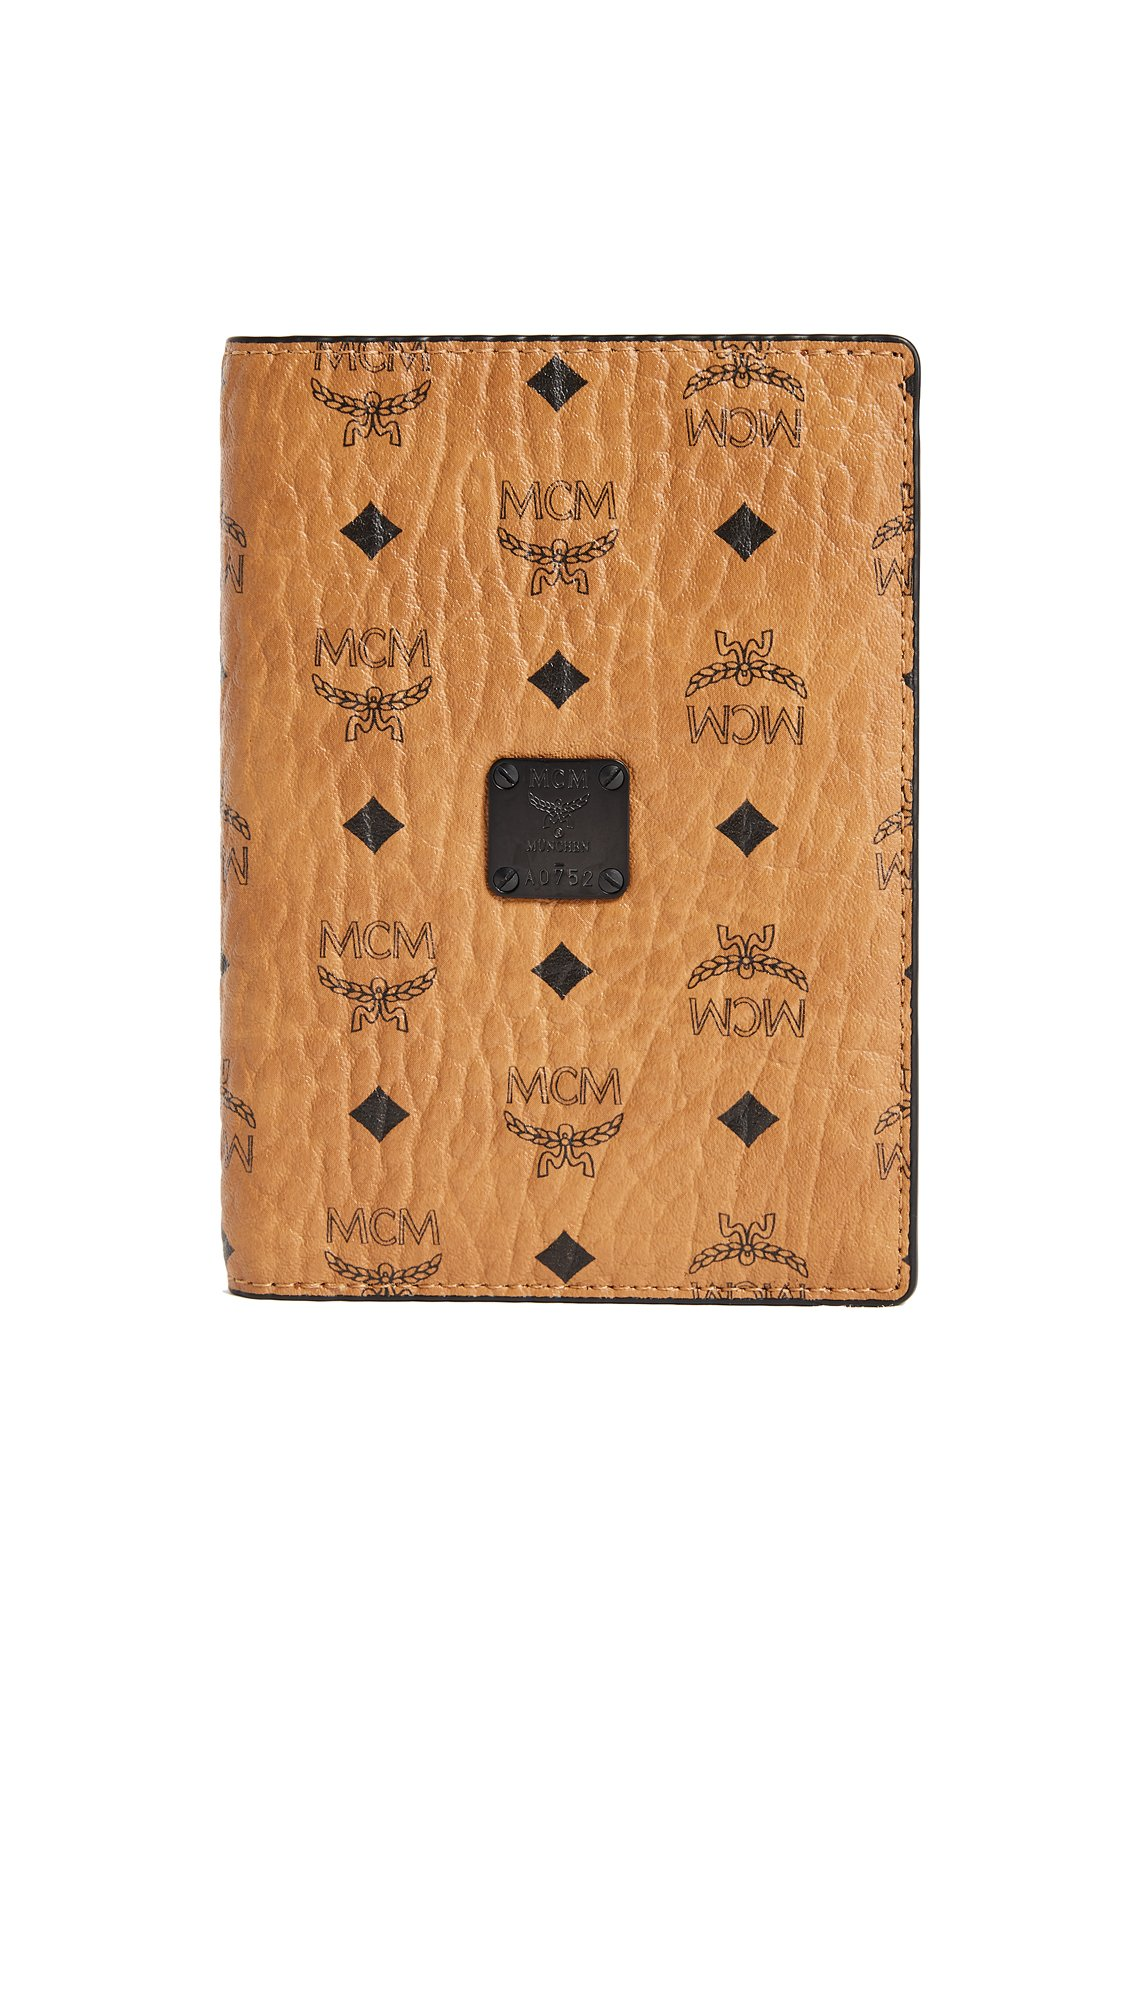 MCM Women's Nomad Passport Case, Cognac, One Size by MCM